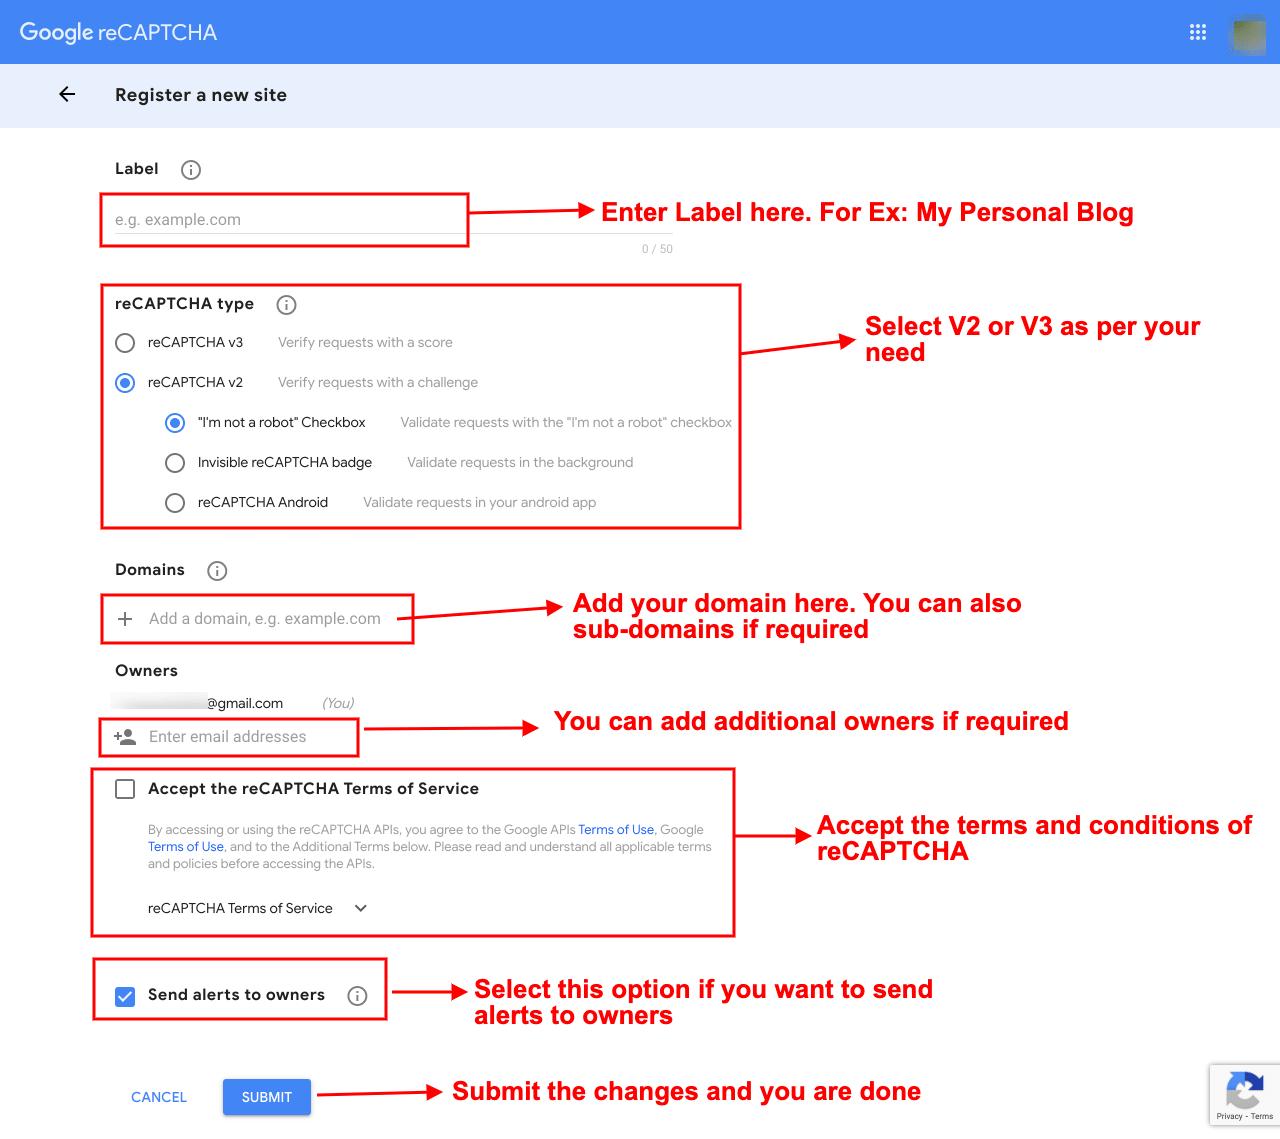 Register new site in Google reCAPTCHA